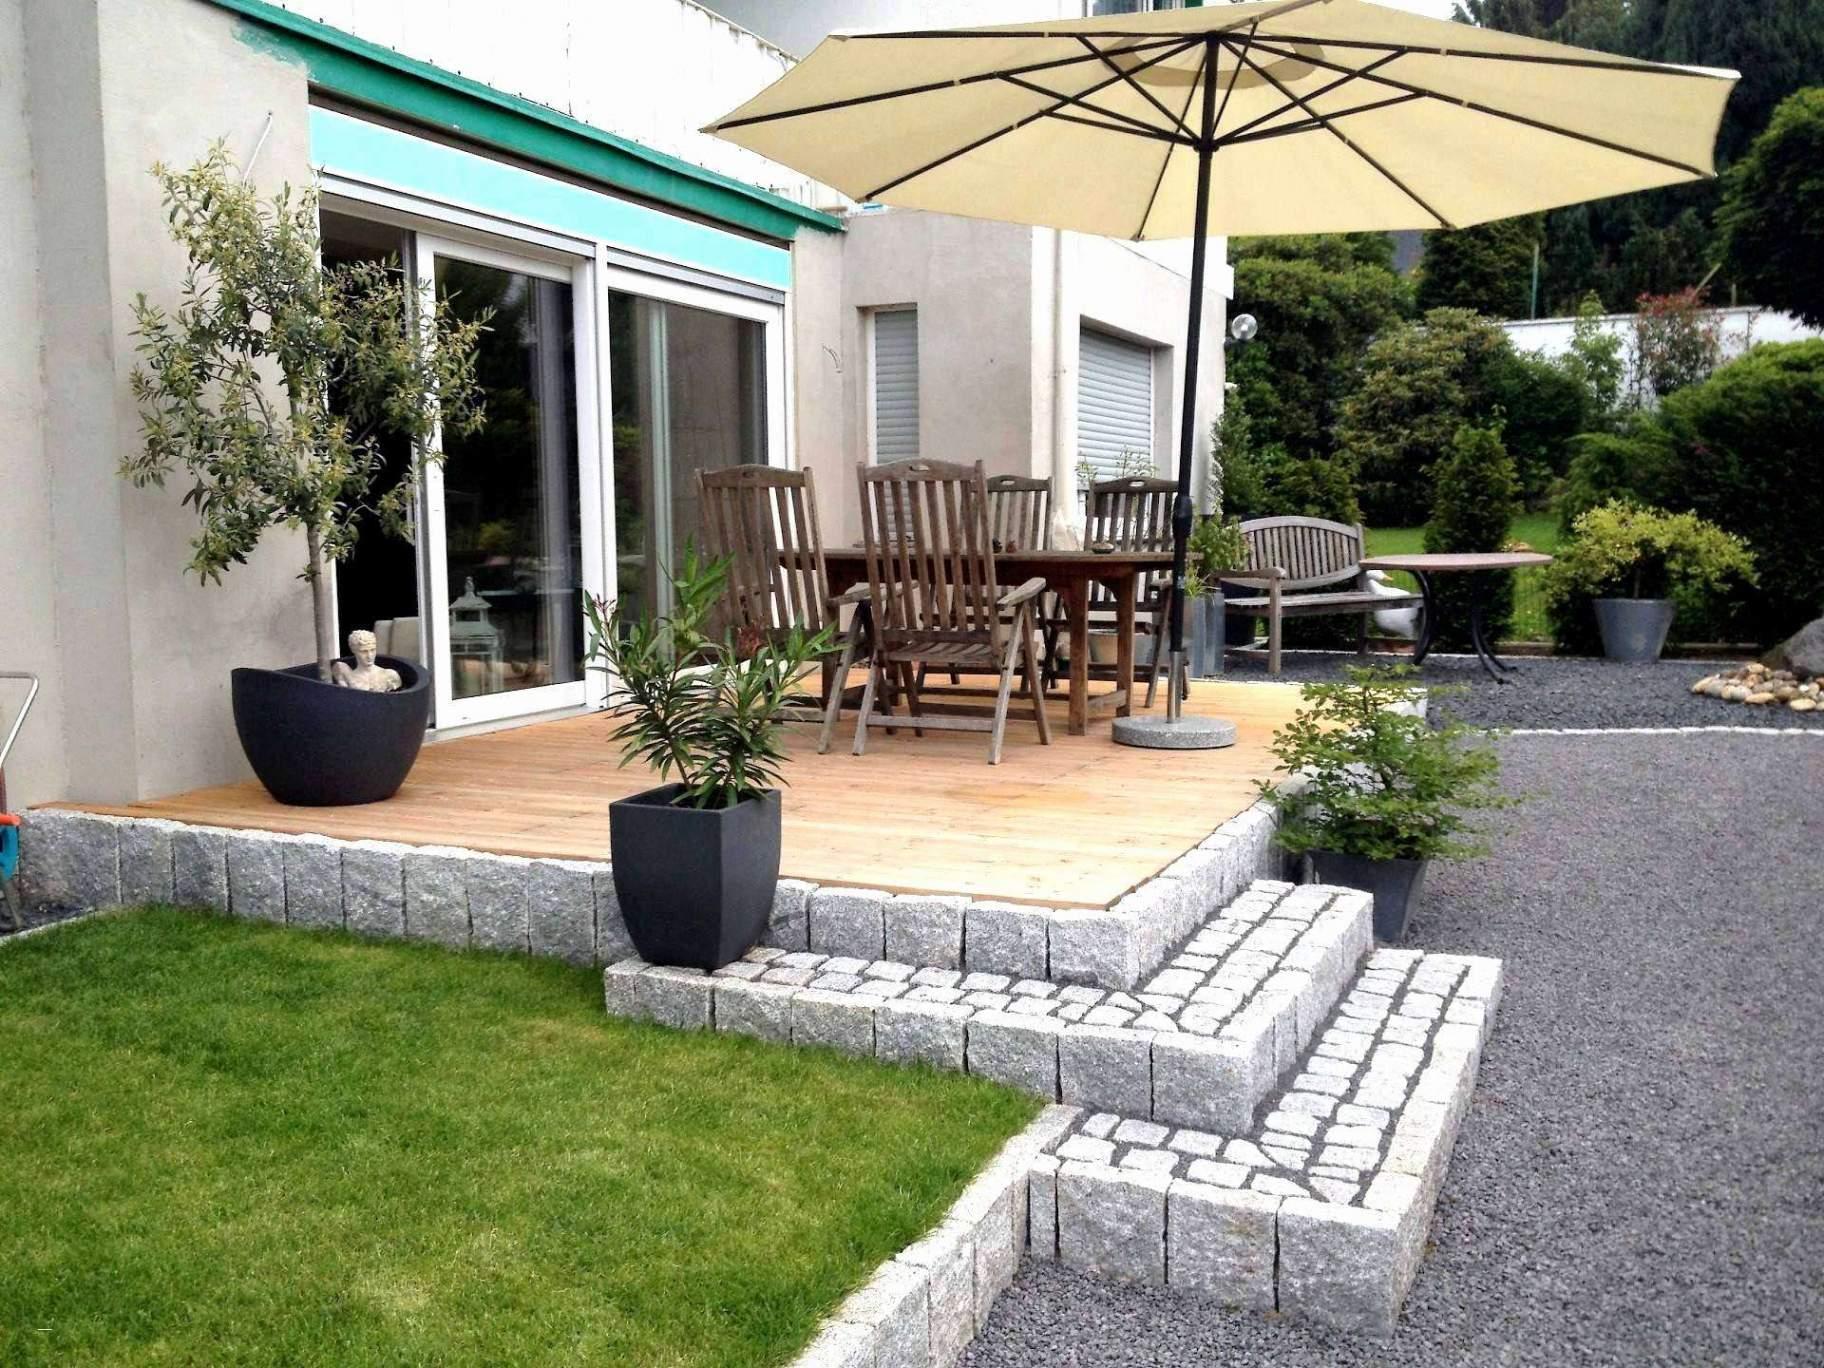 Garten Grillplatz Neu Grillplatz Im Garten — Temobardz Home Blog